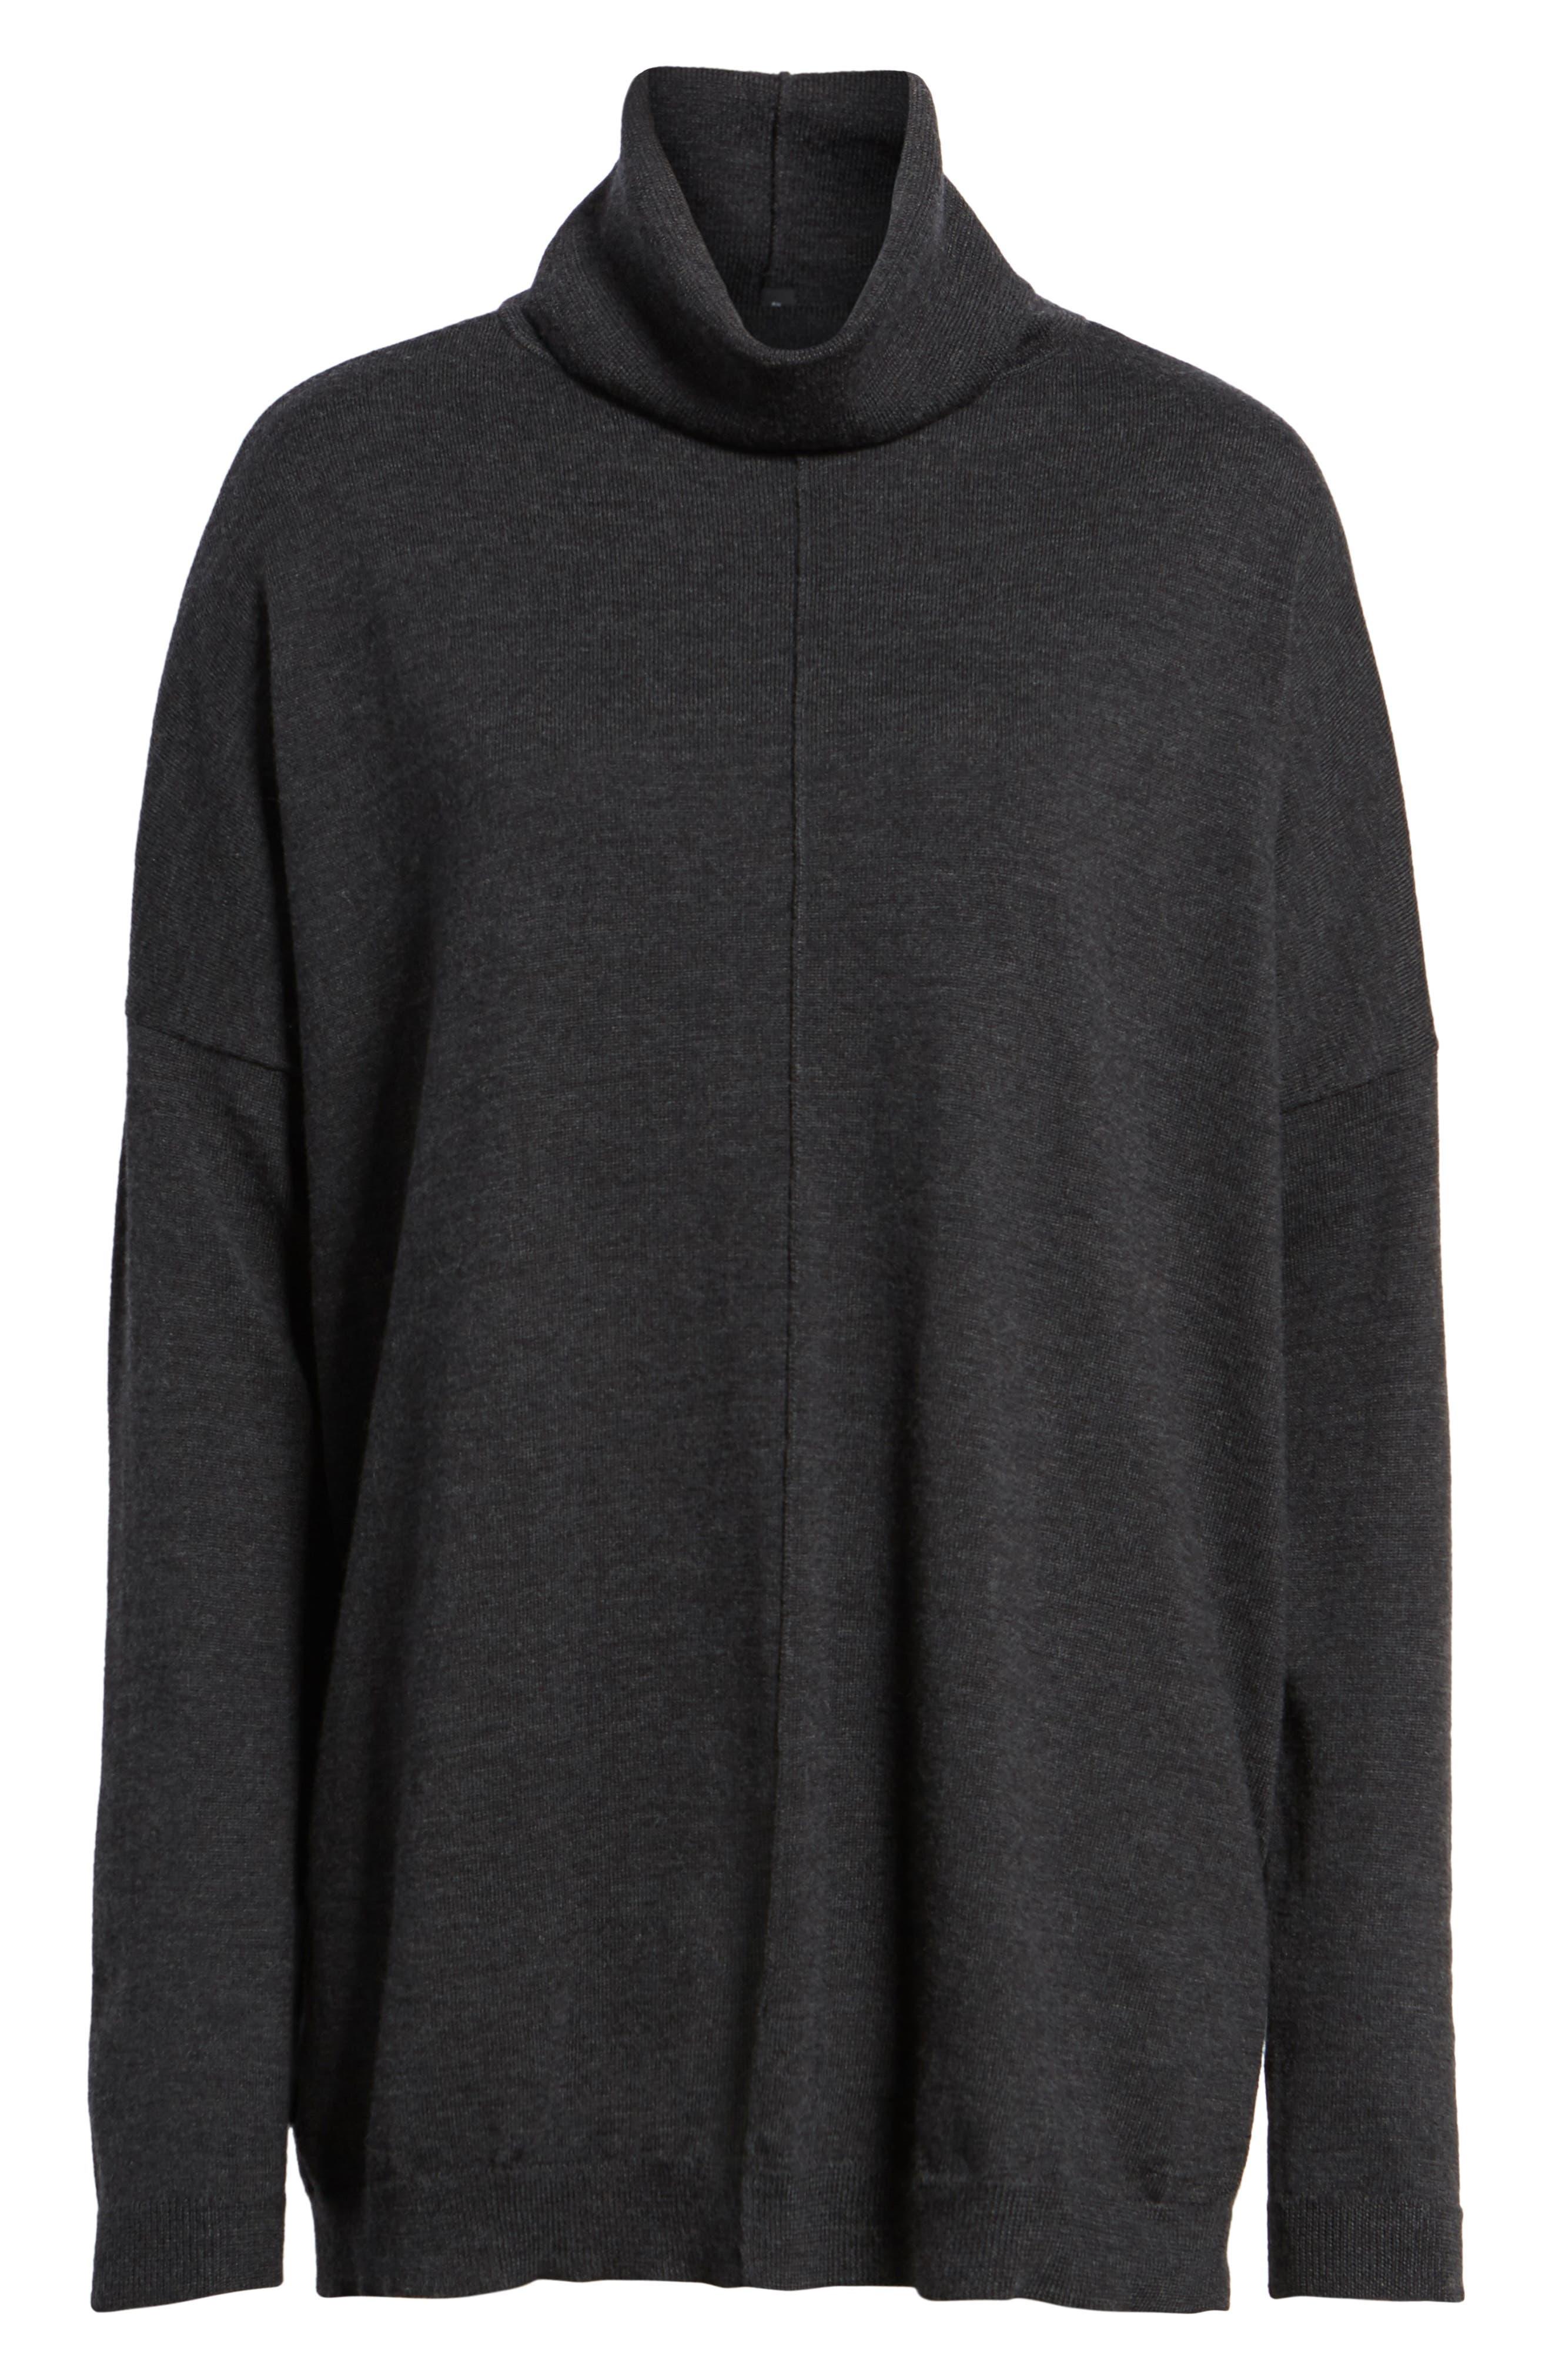 Merino Wool Boxy Turtleneck Sweater,                             Main thumbnail 1, color,                             Charcoal